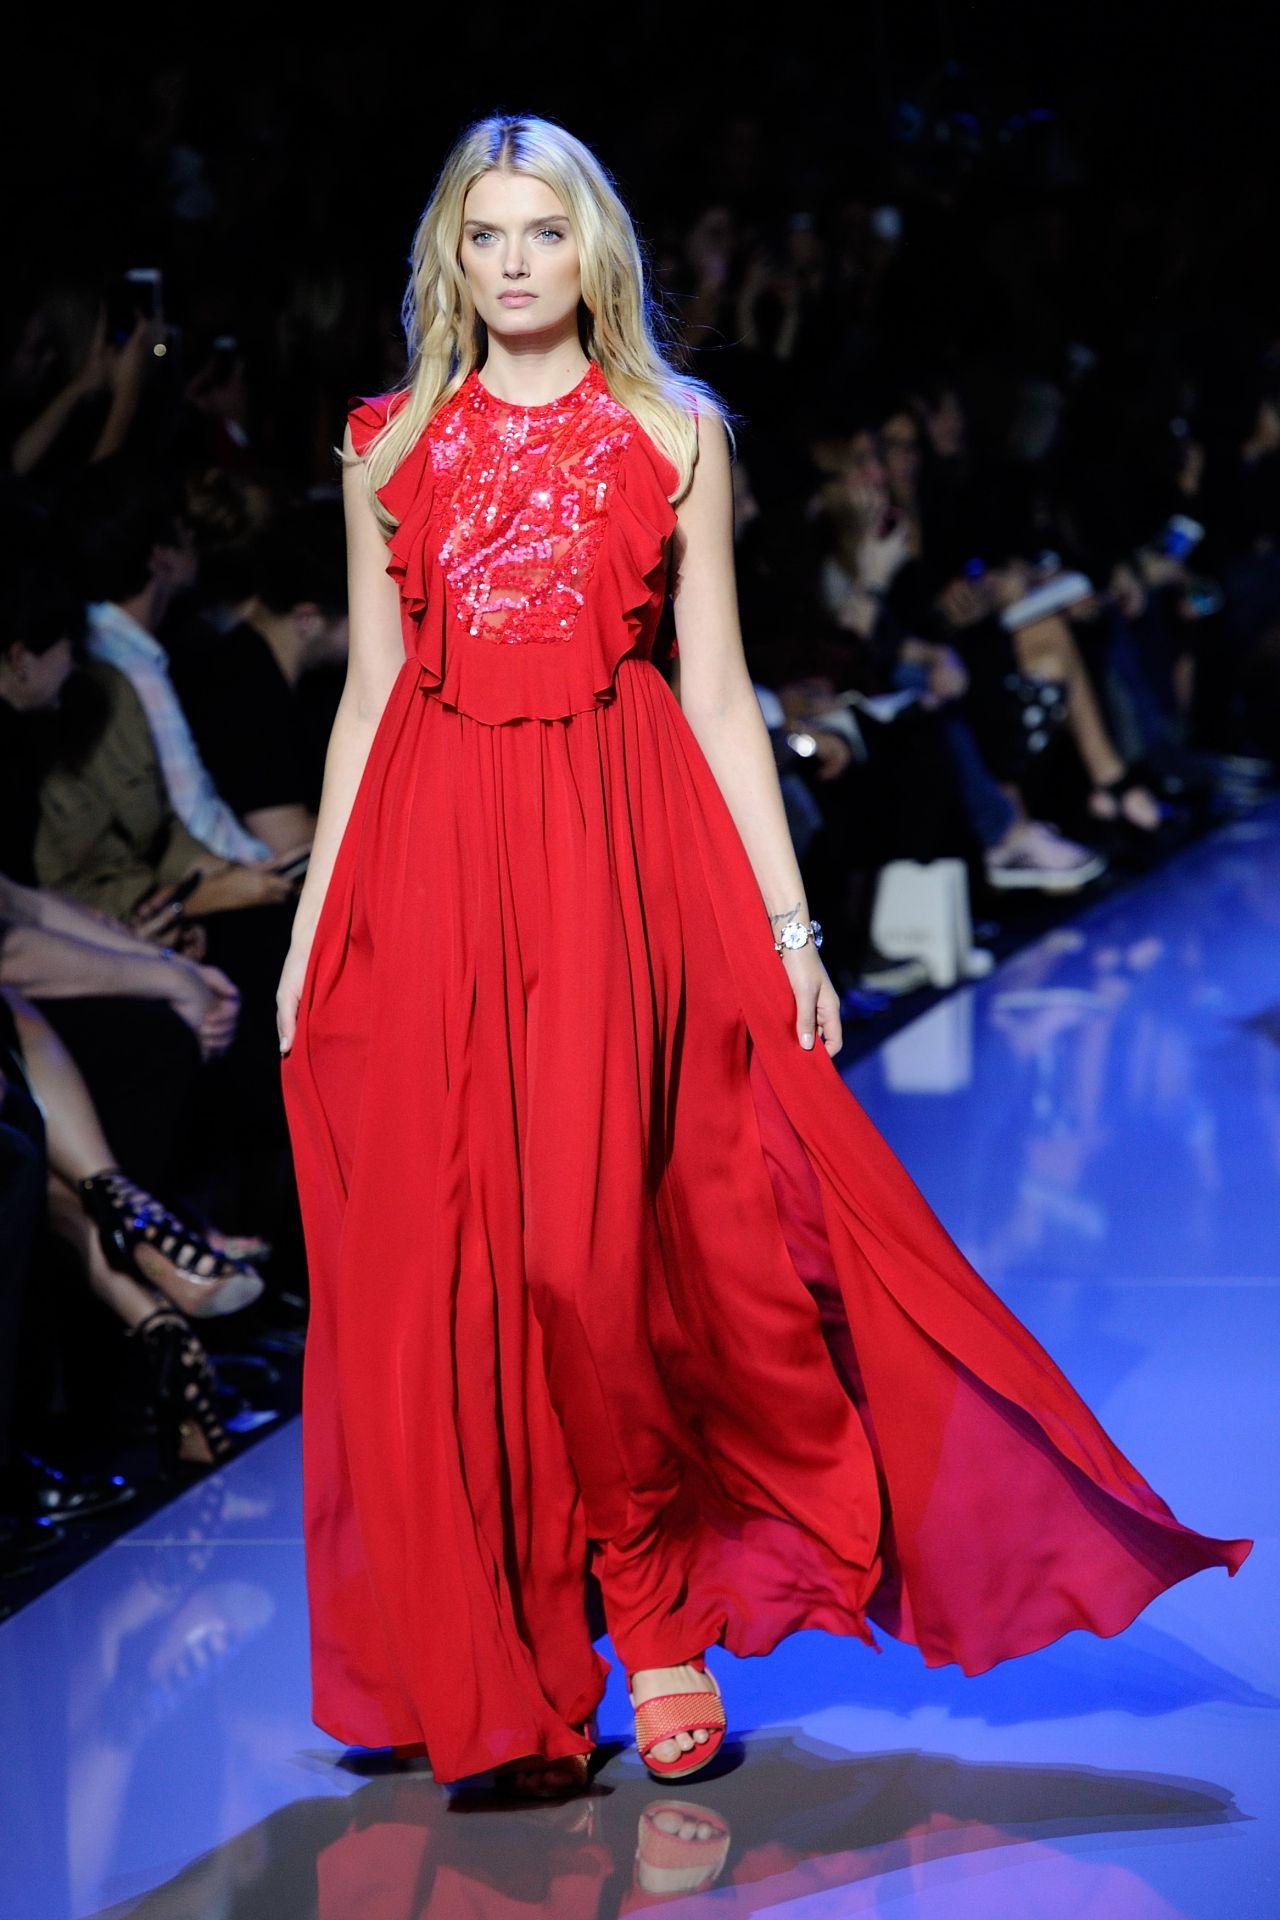 Fashion October 2016: Elie Saab Fashion Show In Paris, October 2015